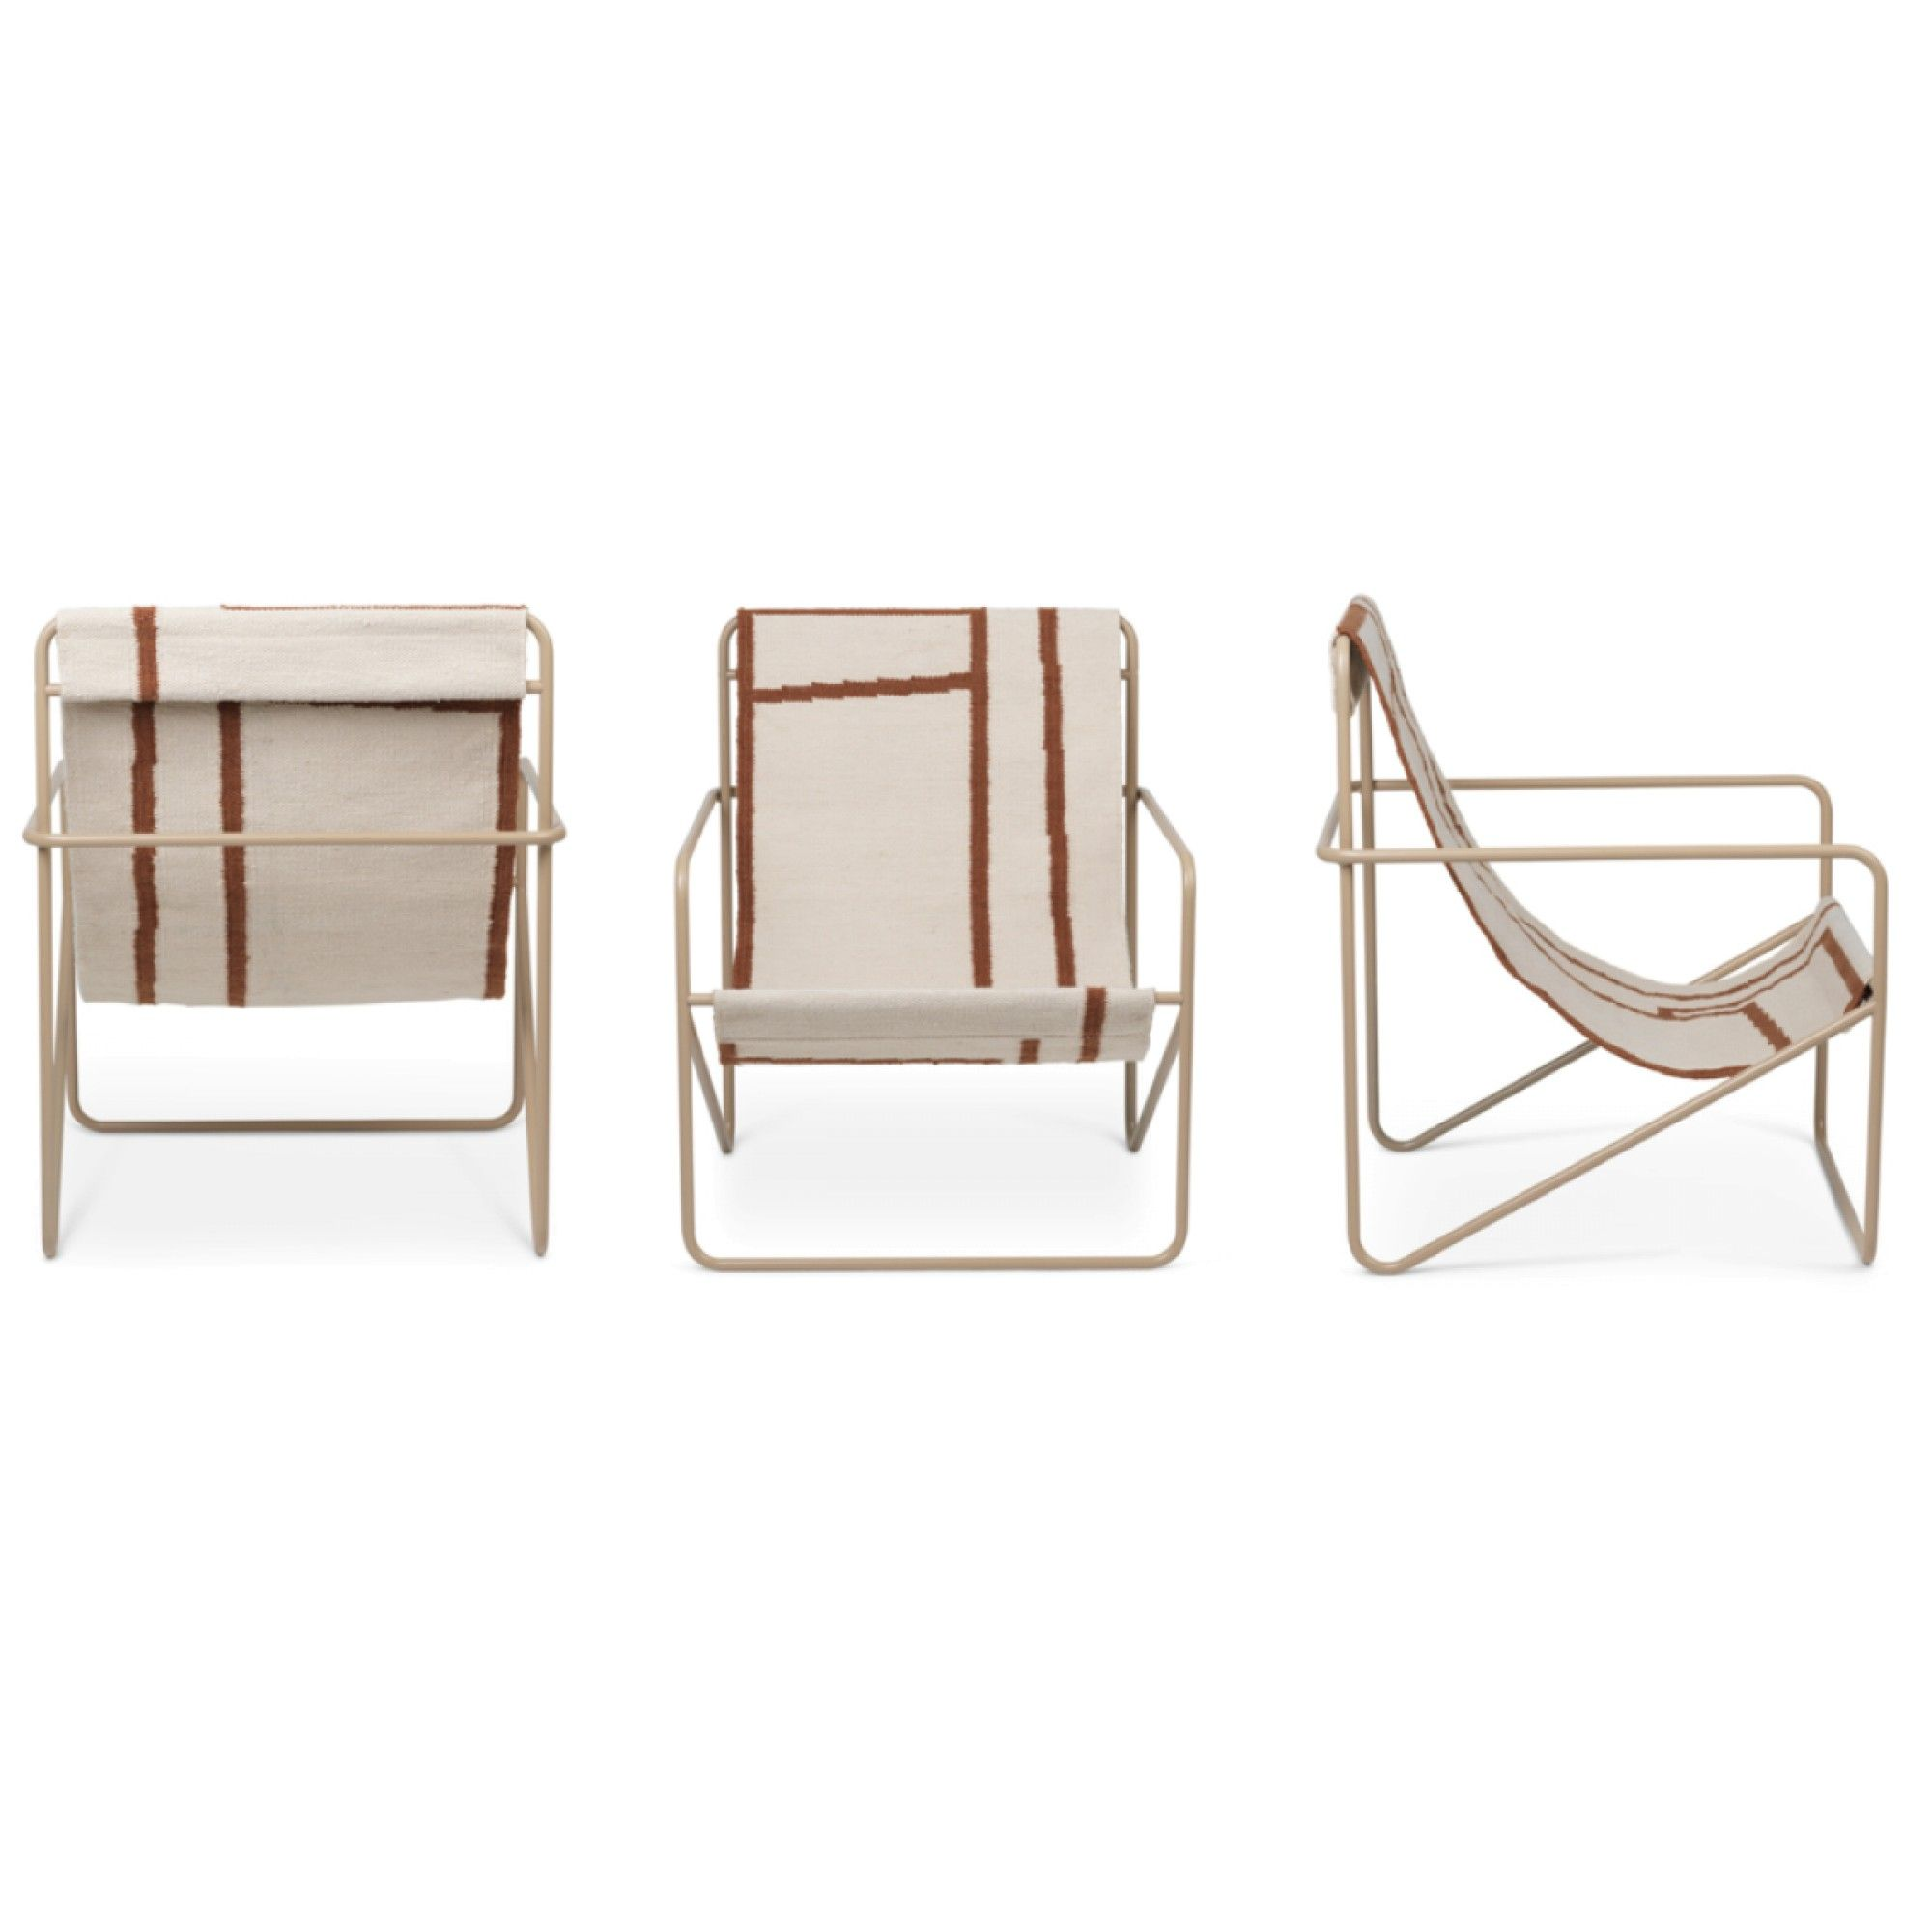 Design Chair By Ferm Living Luxury Interior Design Online Shop In 2020 Online Shop Design Chair Design Online Interior Design